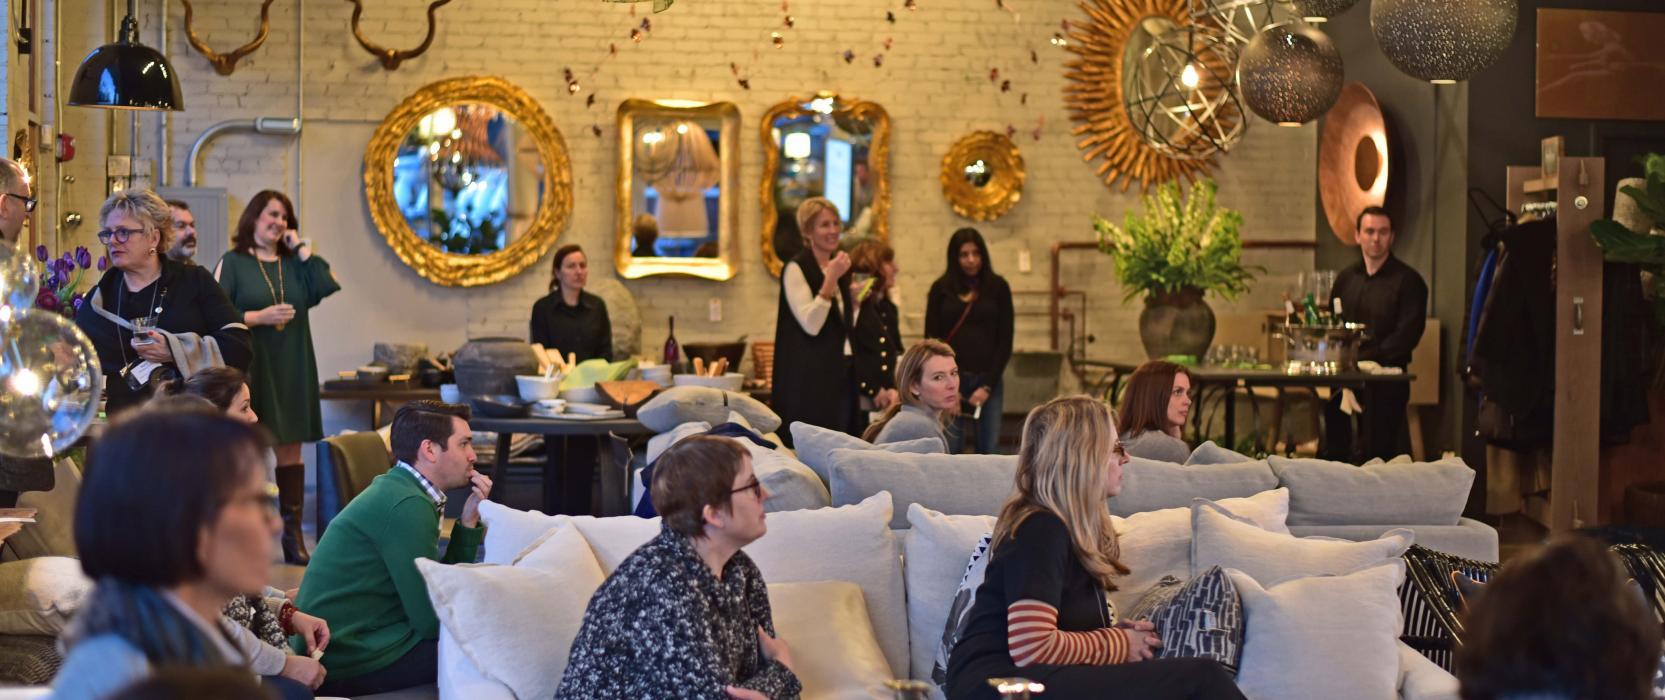 Artefact Home|Garden Luxury Craft Event in Belmont, MA